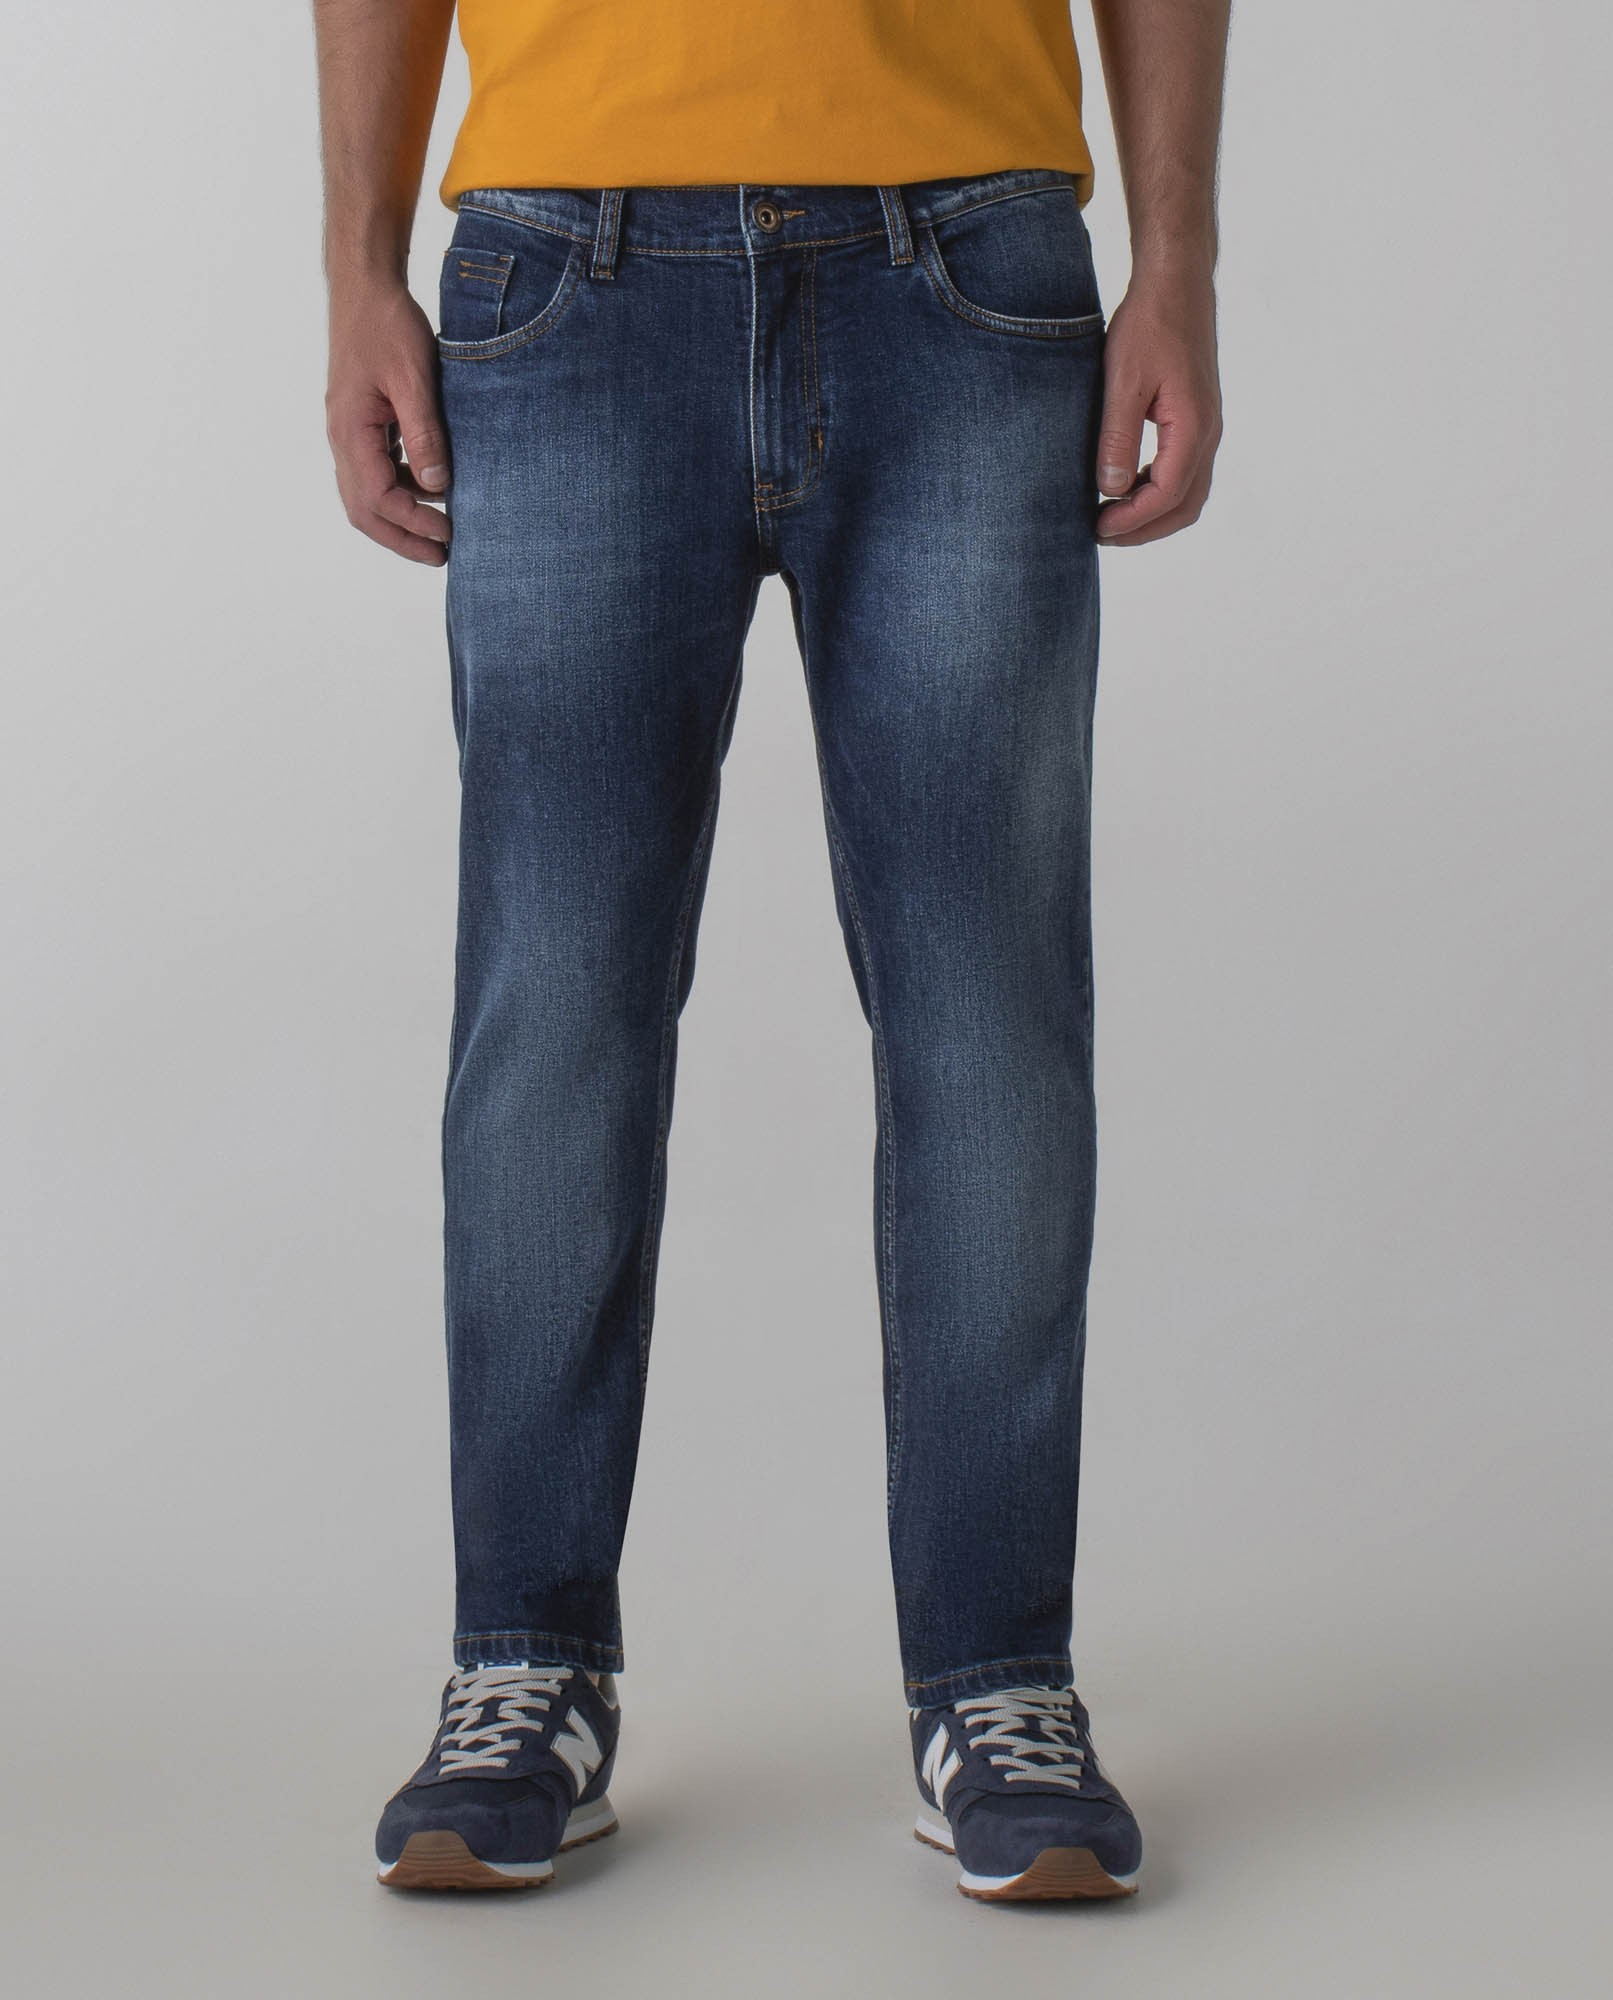 Calça jeans super slim - Wave